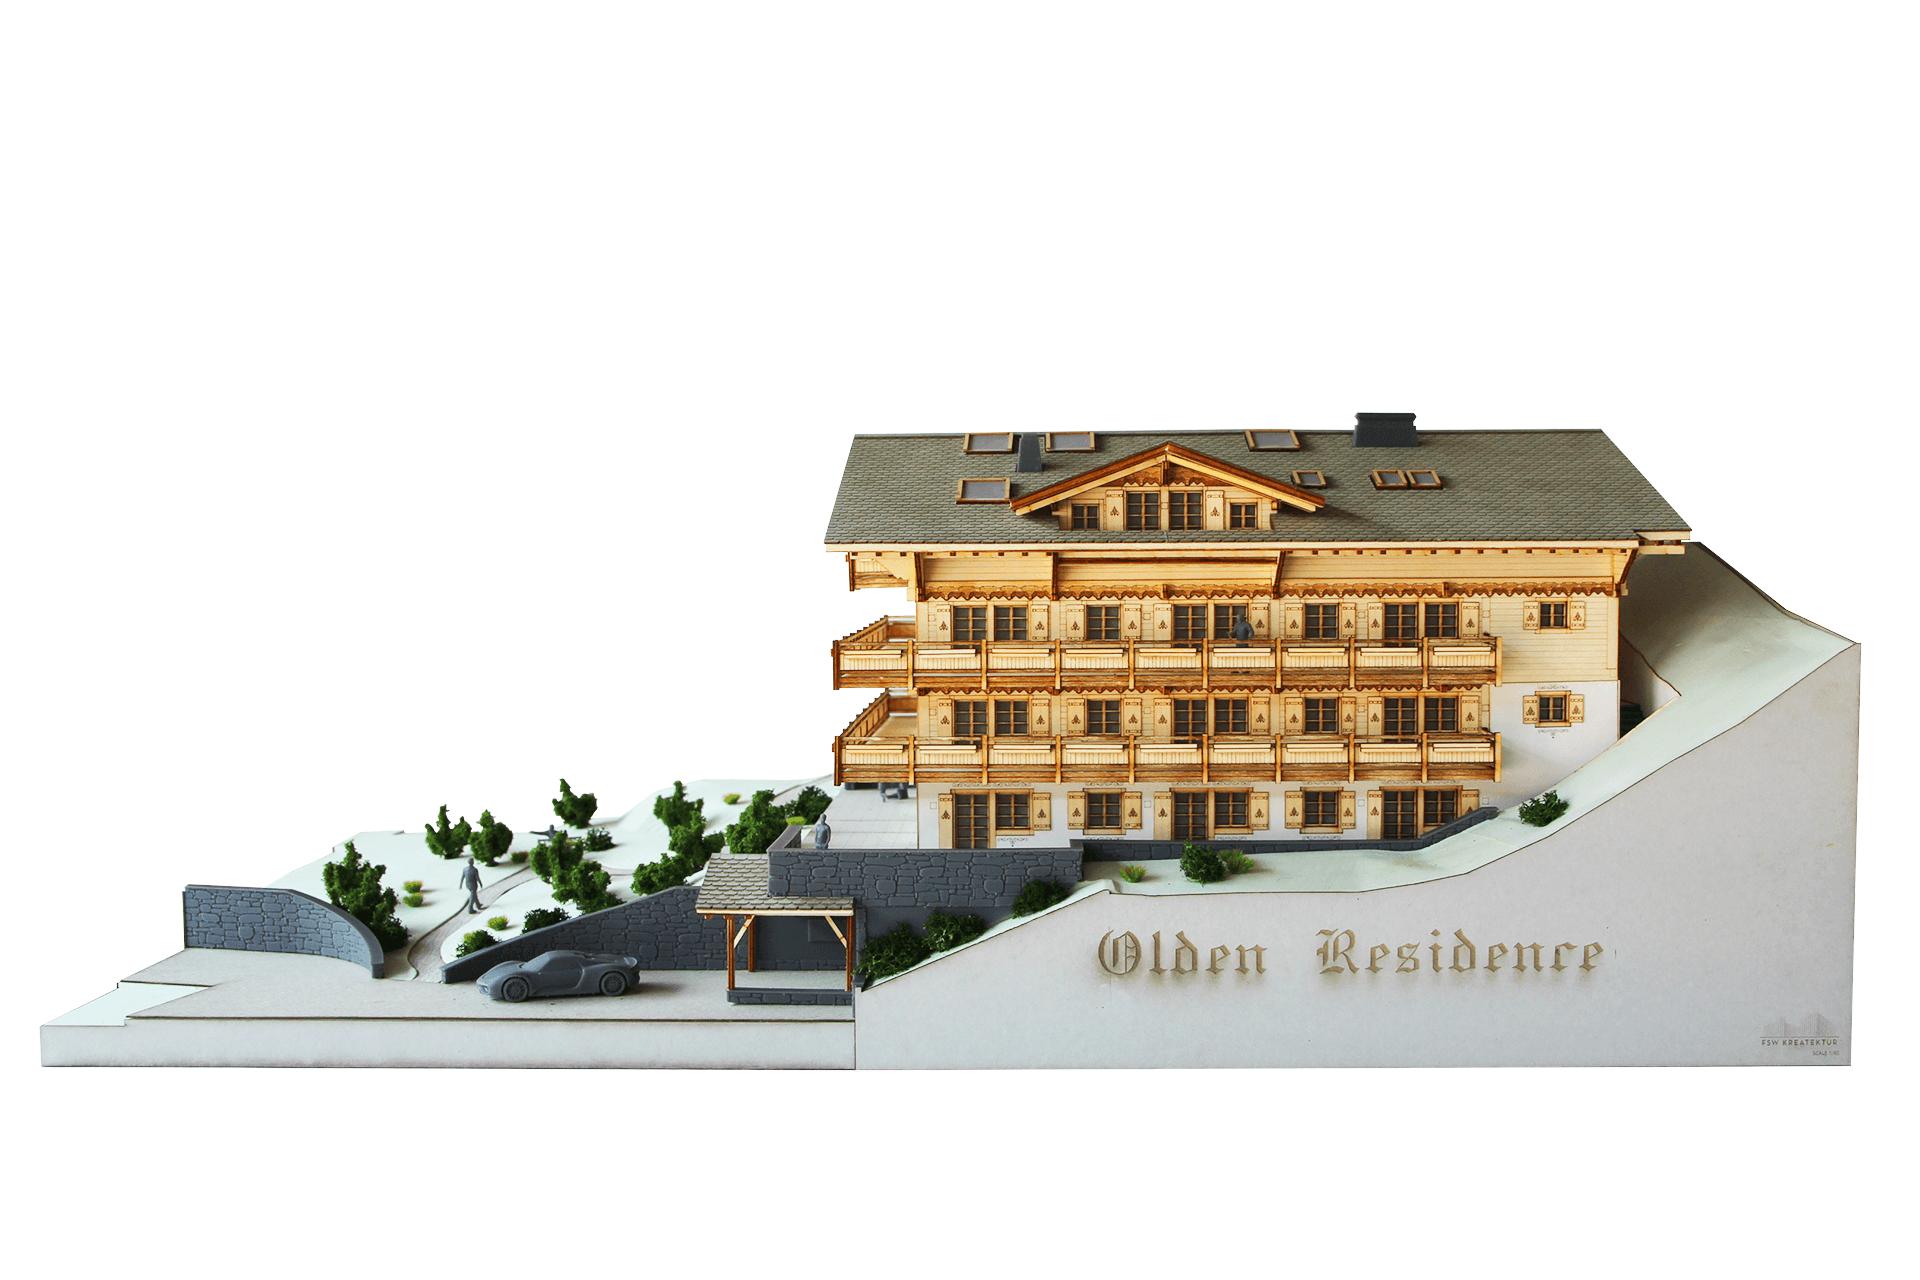 https://fsw-kreatektur.ch/wp-content/uploads/Fsw-Kreatektur-Architektur-Modellbau-Olden-Residence-Seitenansicht-1.png